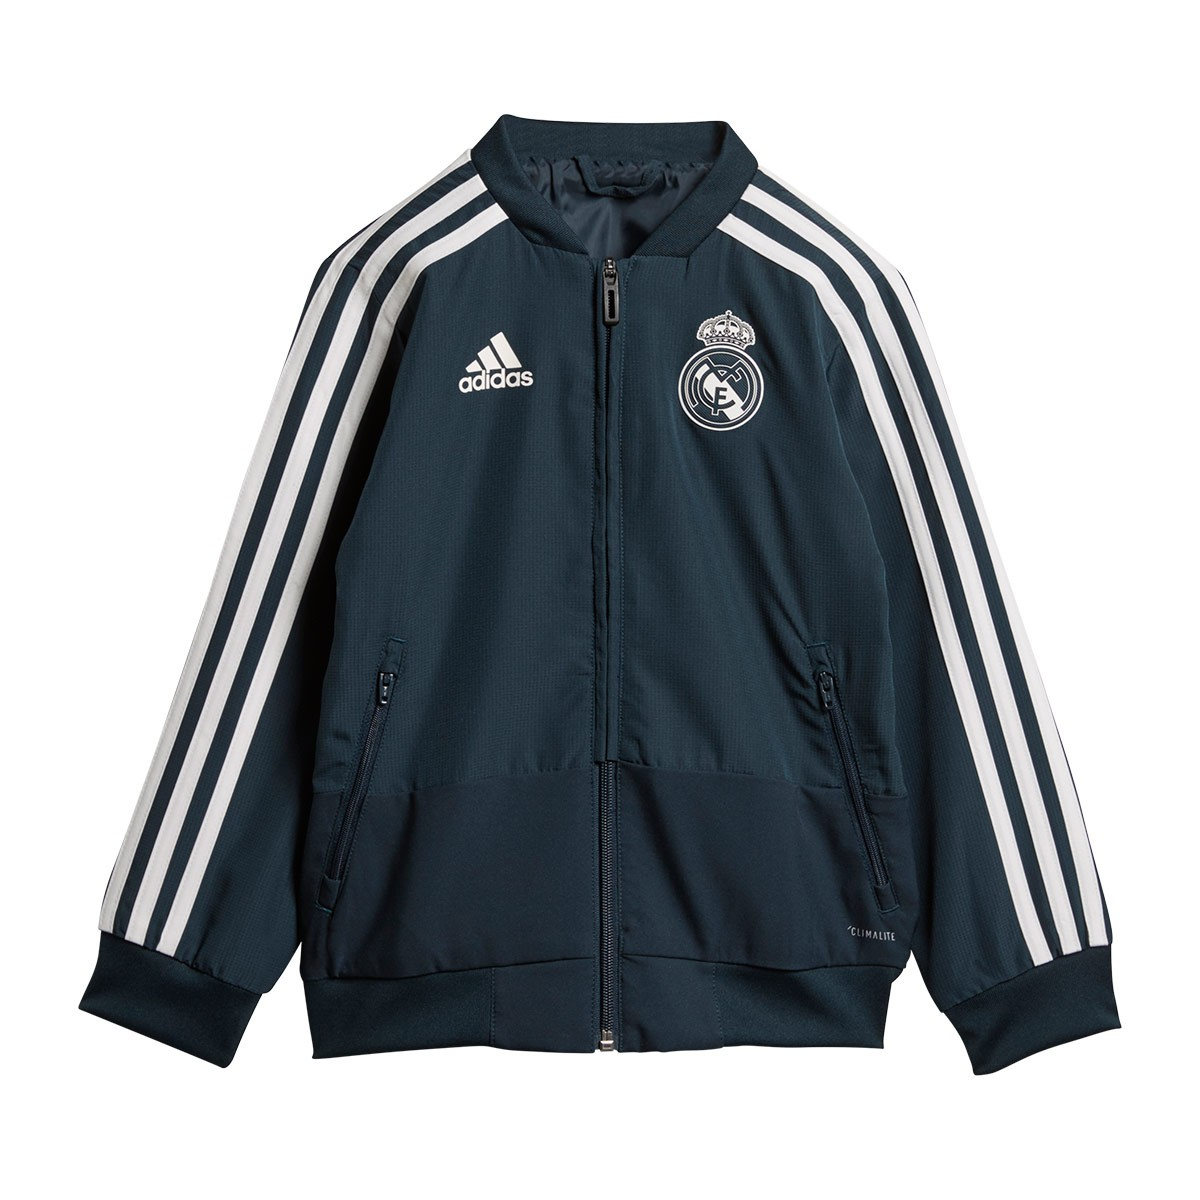 Chándal adidas Real Madrid Prematch Niño 2018-2019 Tech onix-Black ... db7dc0f558b25